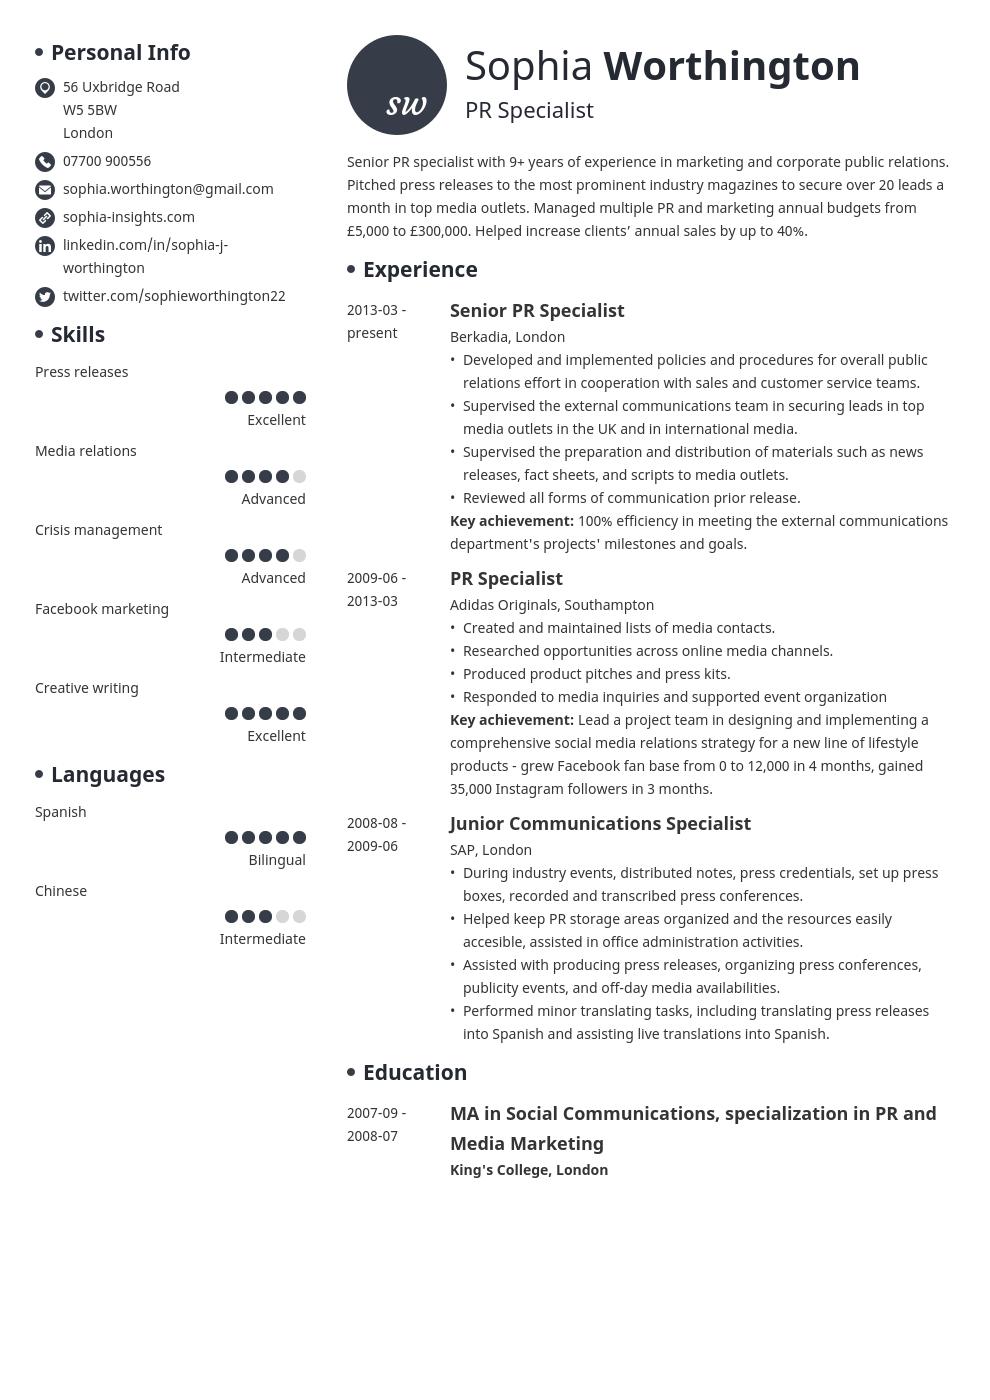 uk skills based cv template initials in 2020 Cv examples